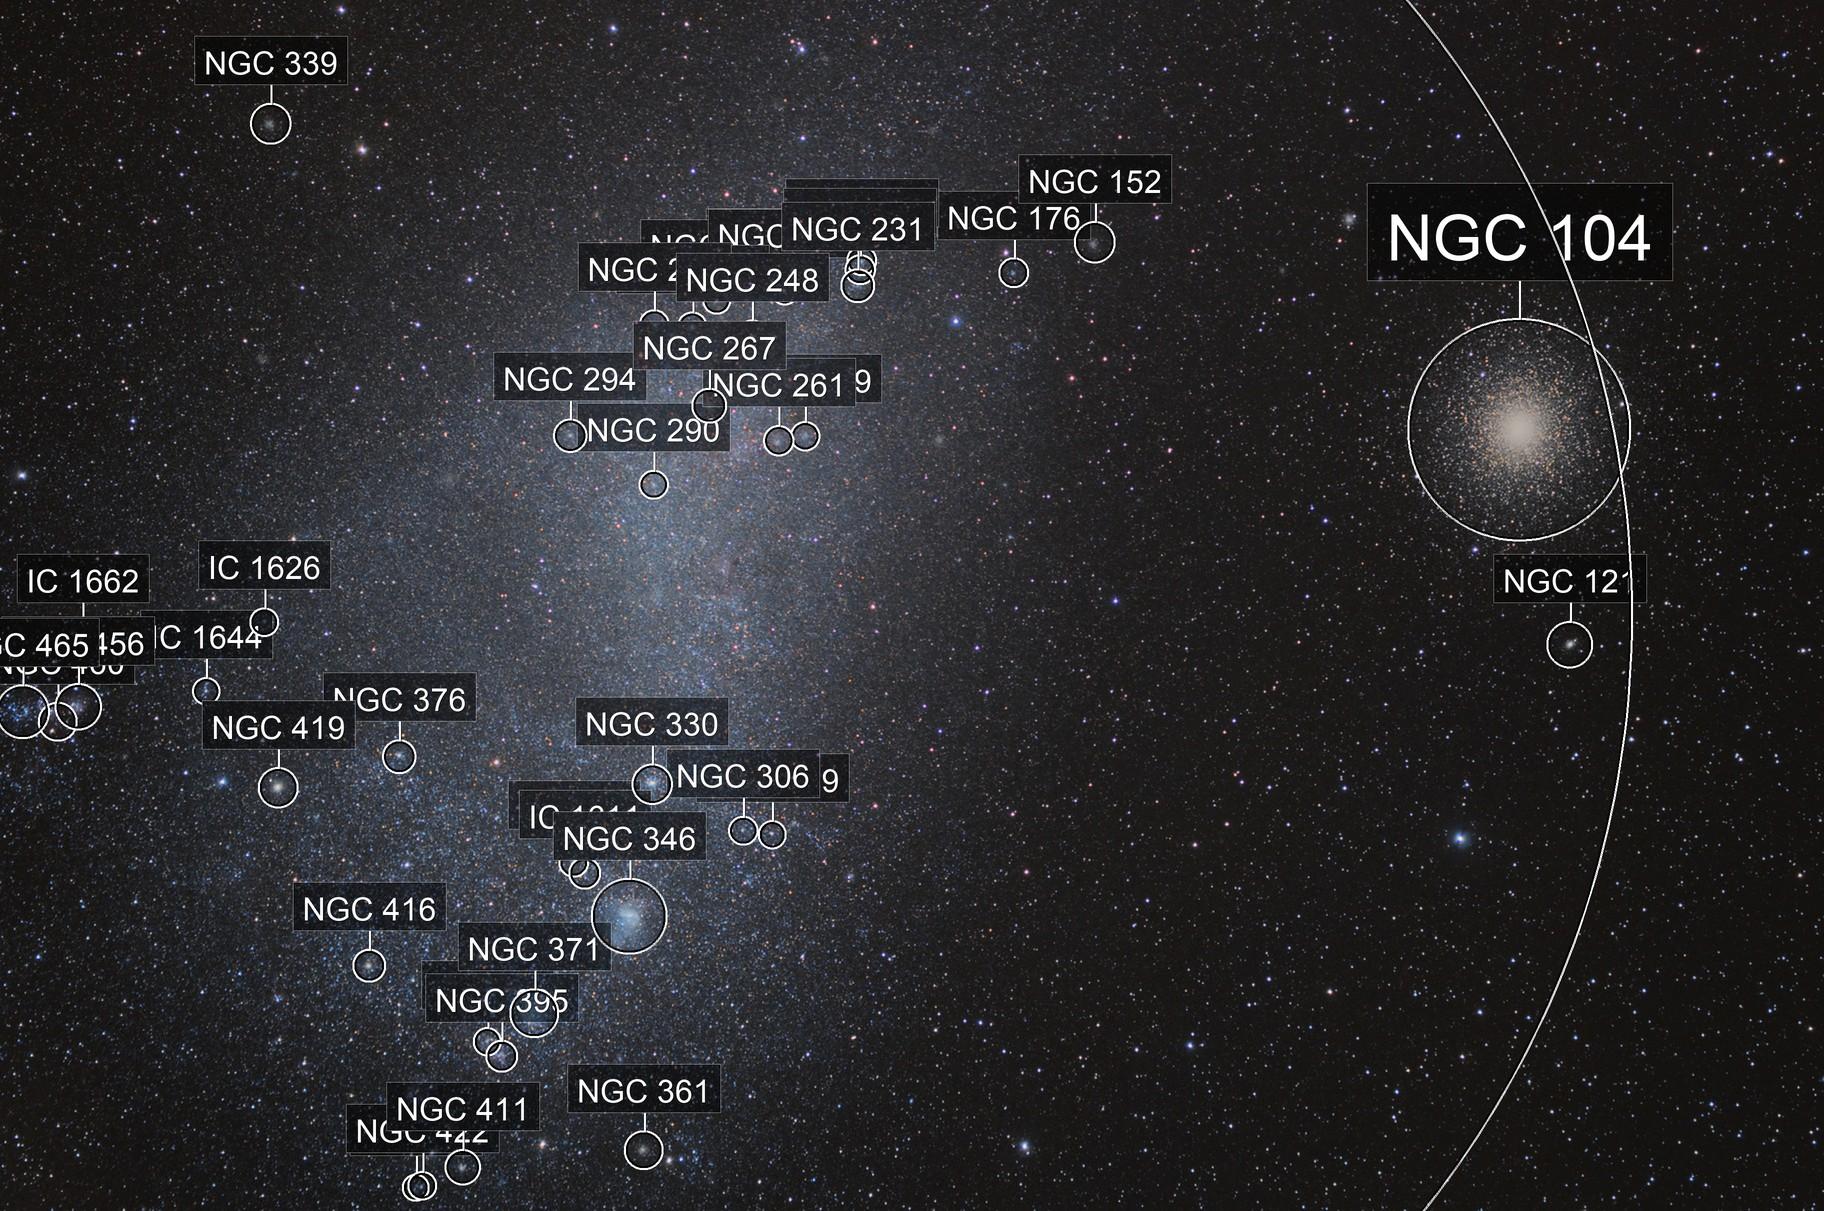 Small Magellanic Cloud + 47 Tucanae